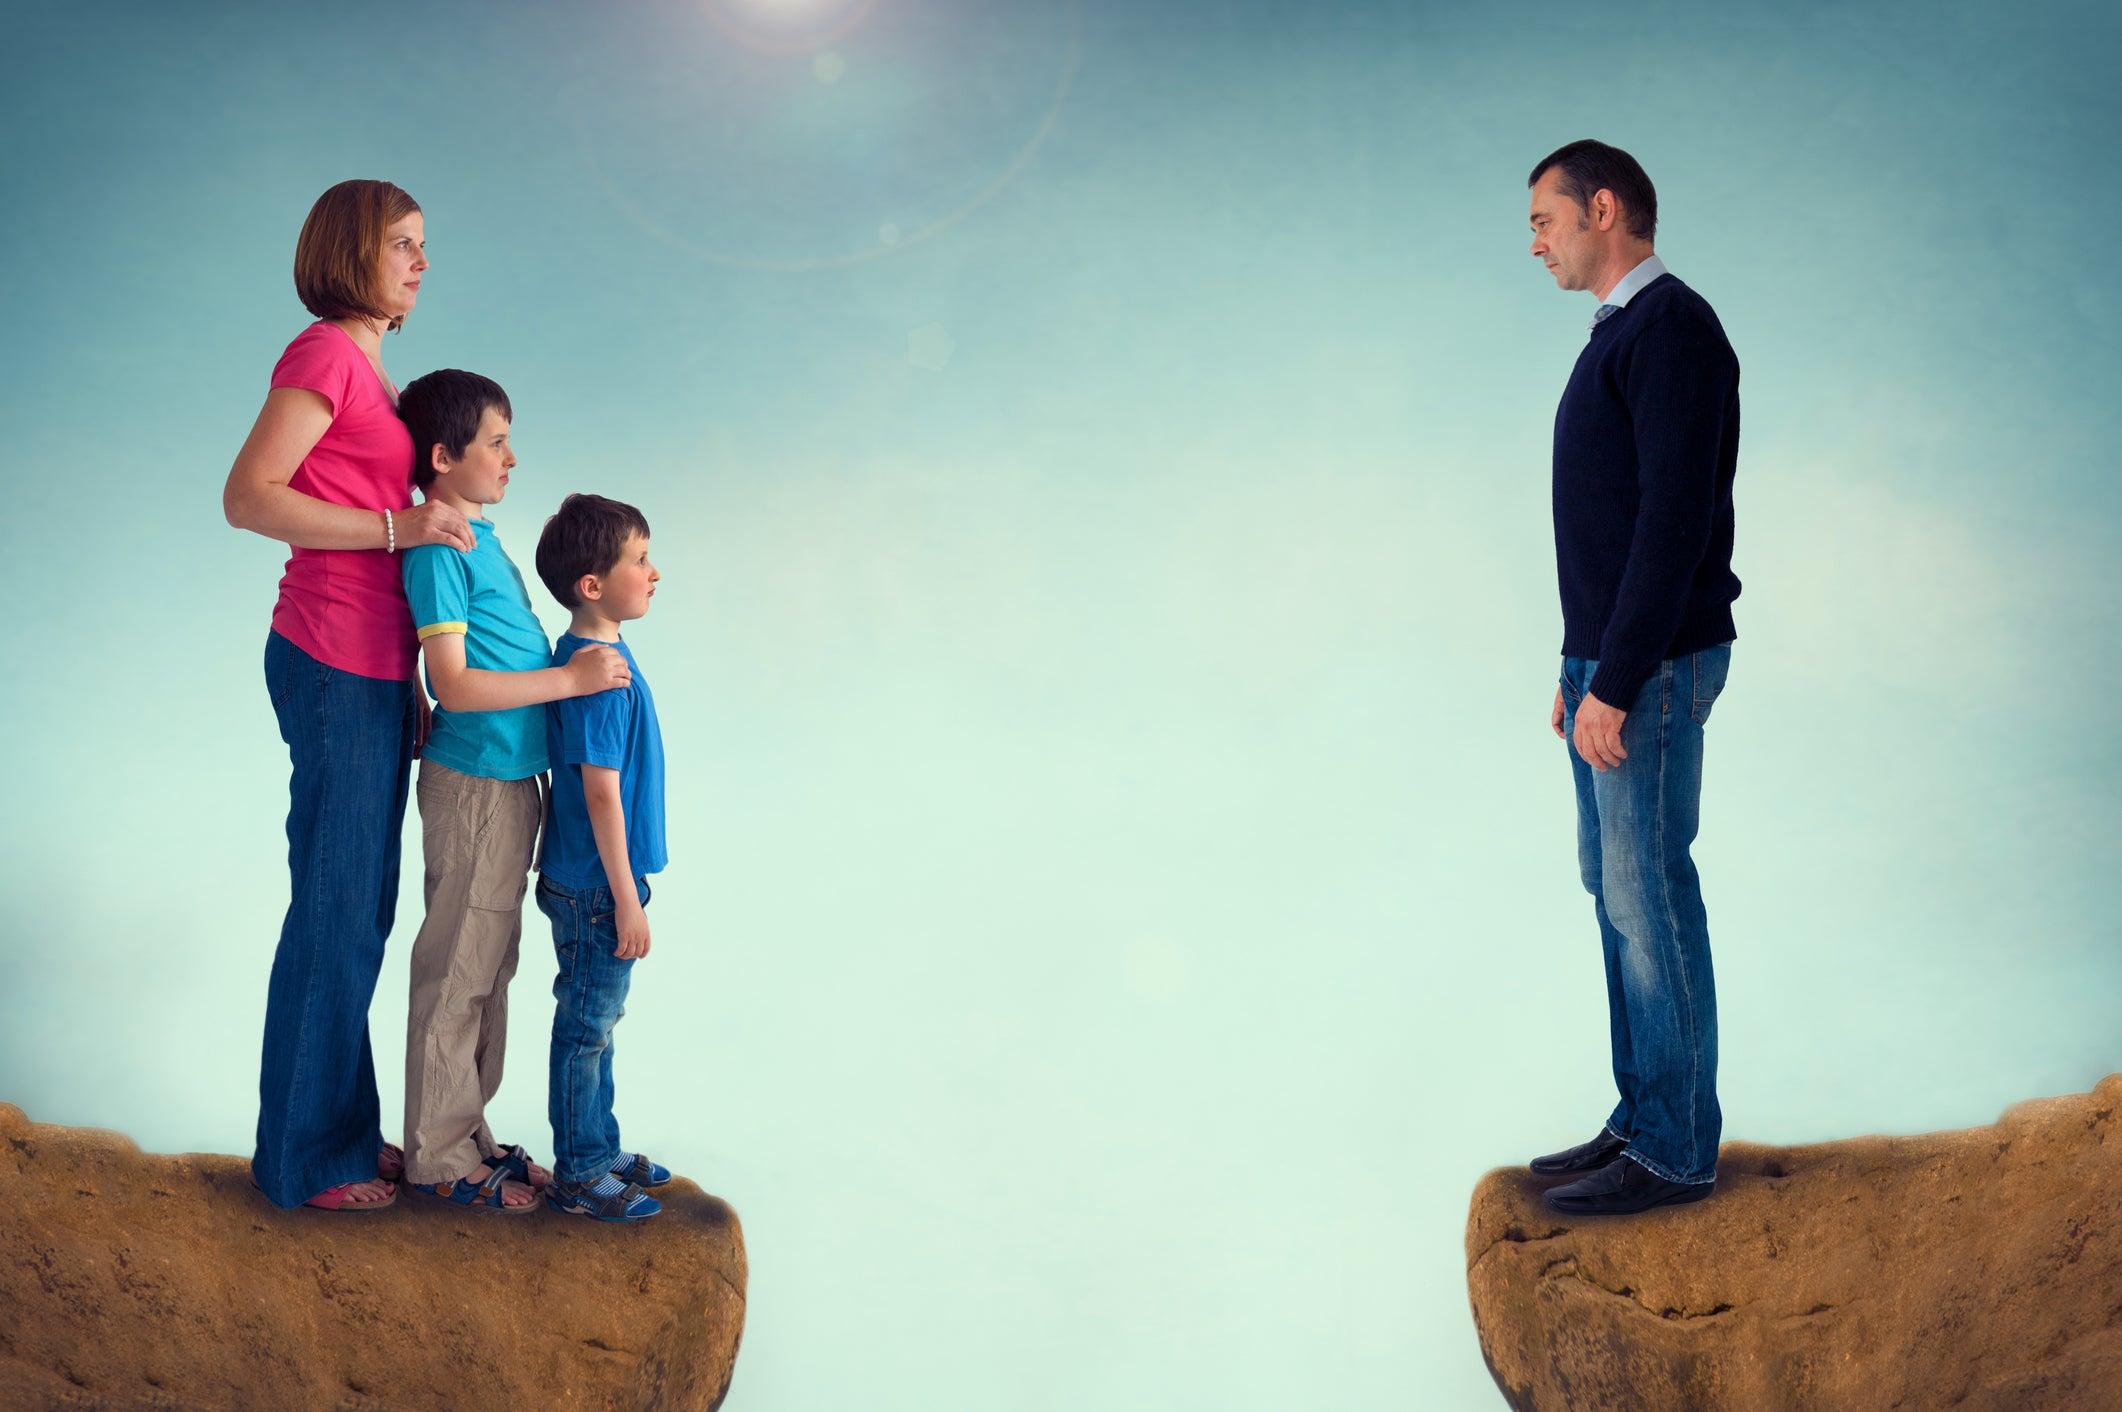 Parenting Arrangements and COVID-19